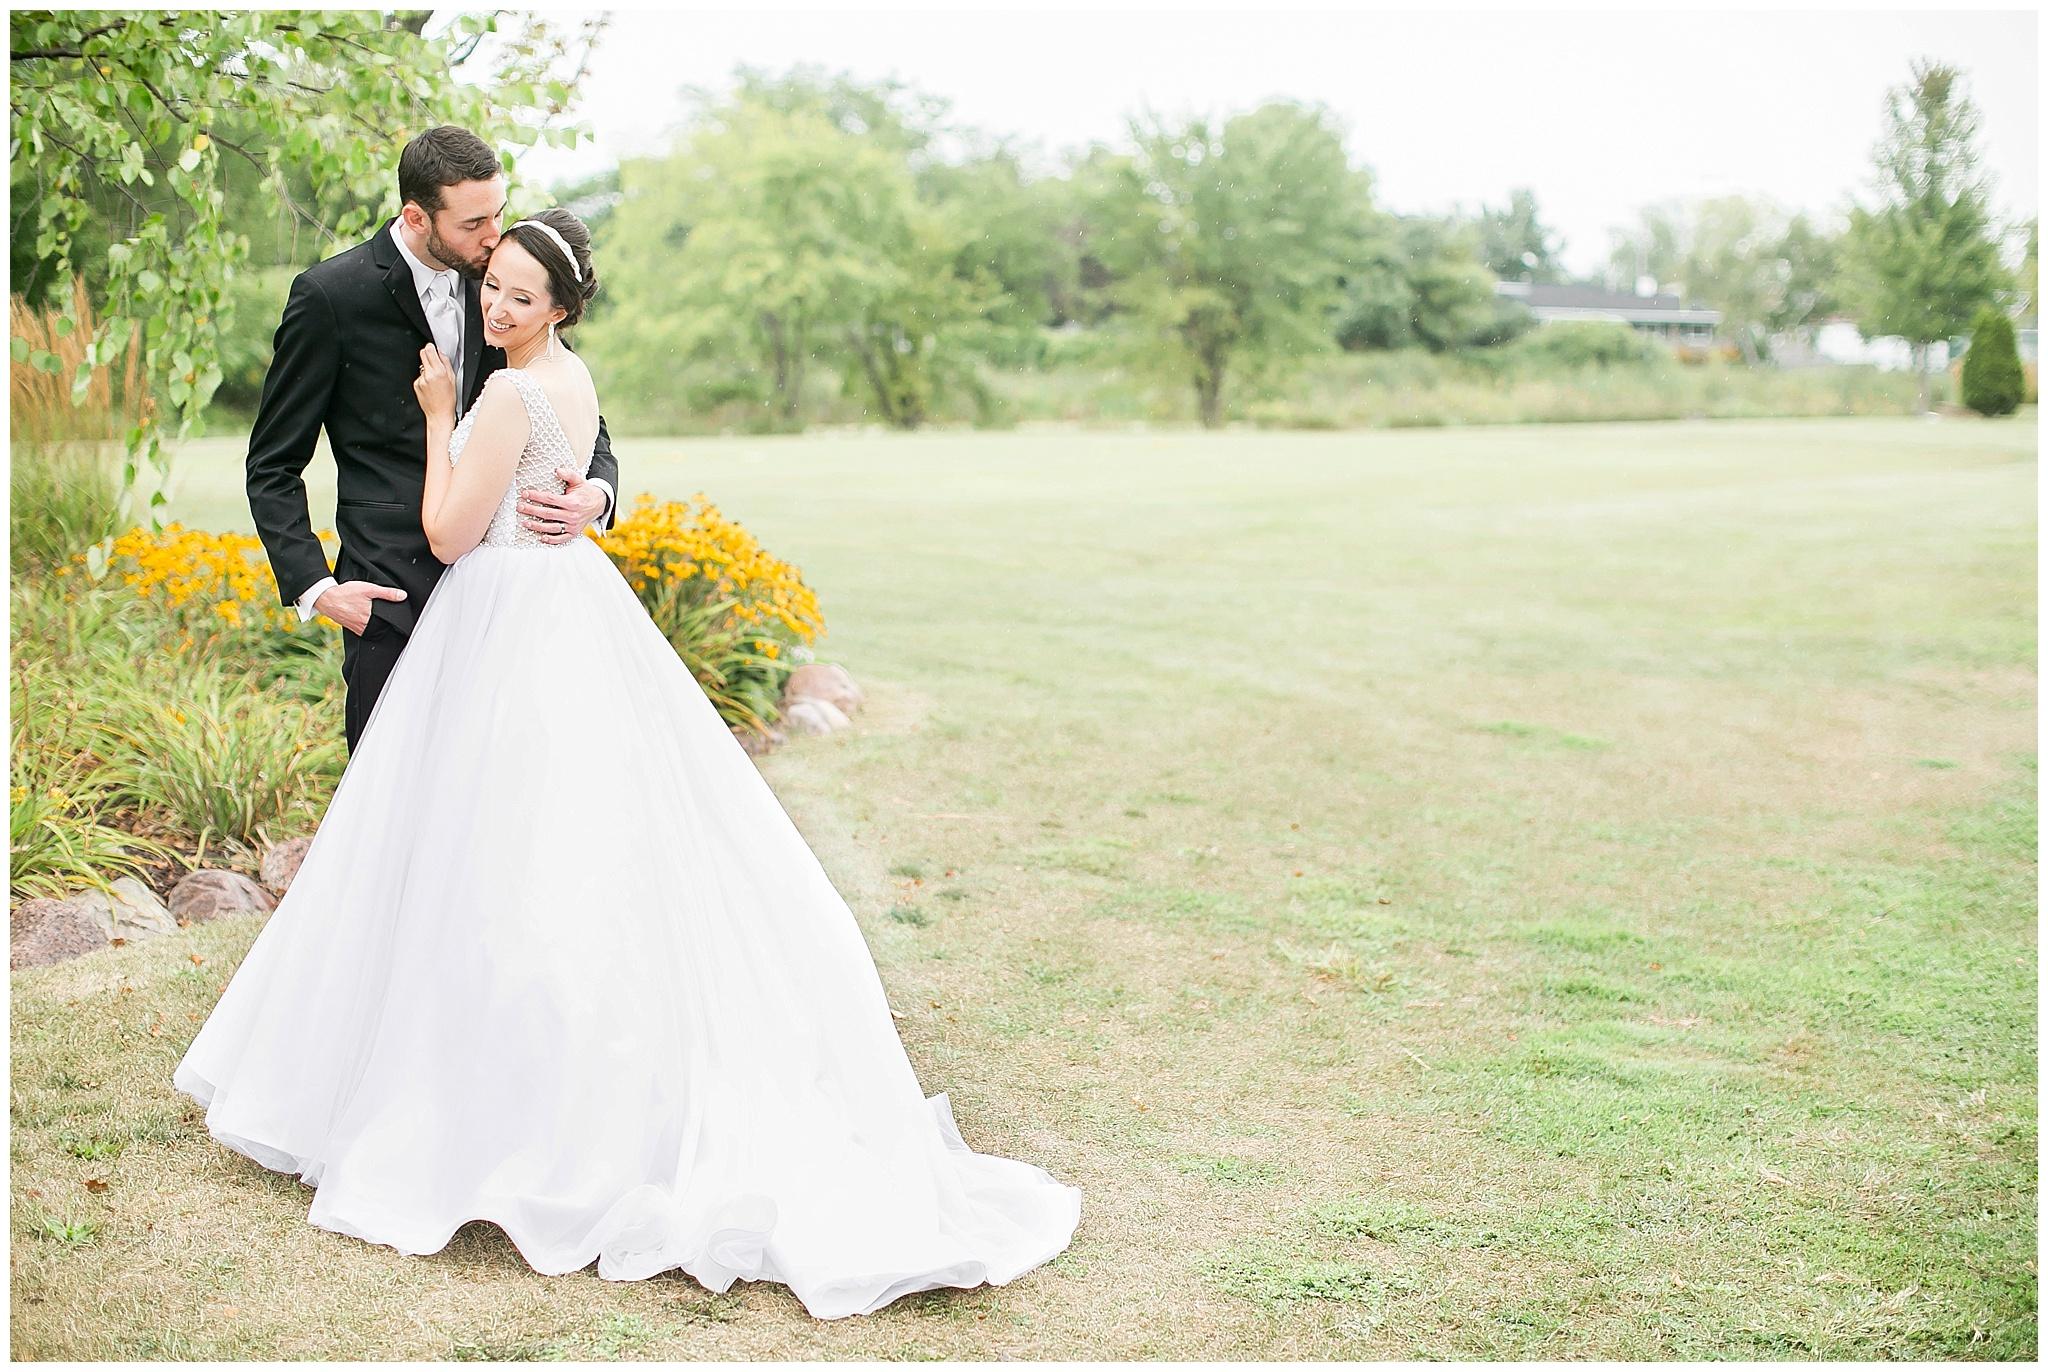 bridgewood_resort_wedding_neenah_wisconsin_0340.jpg